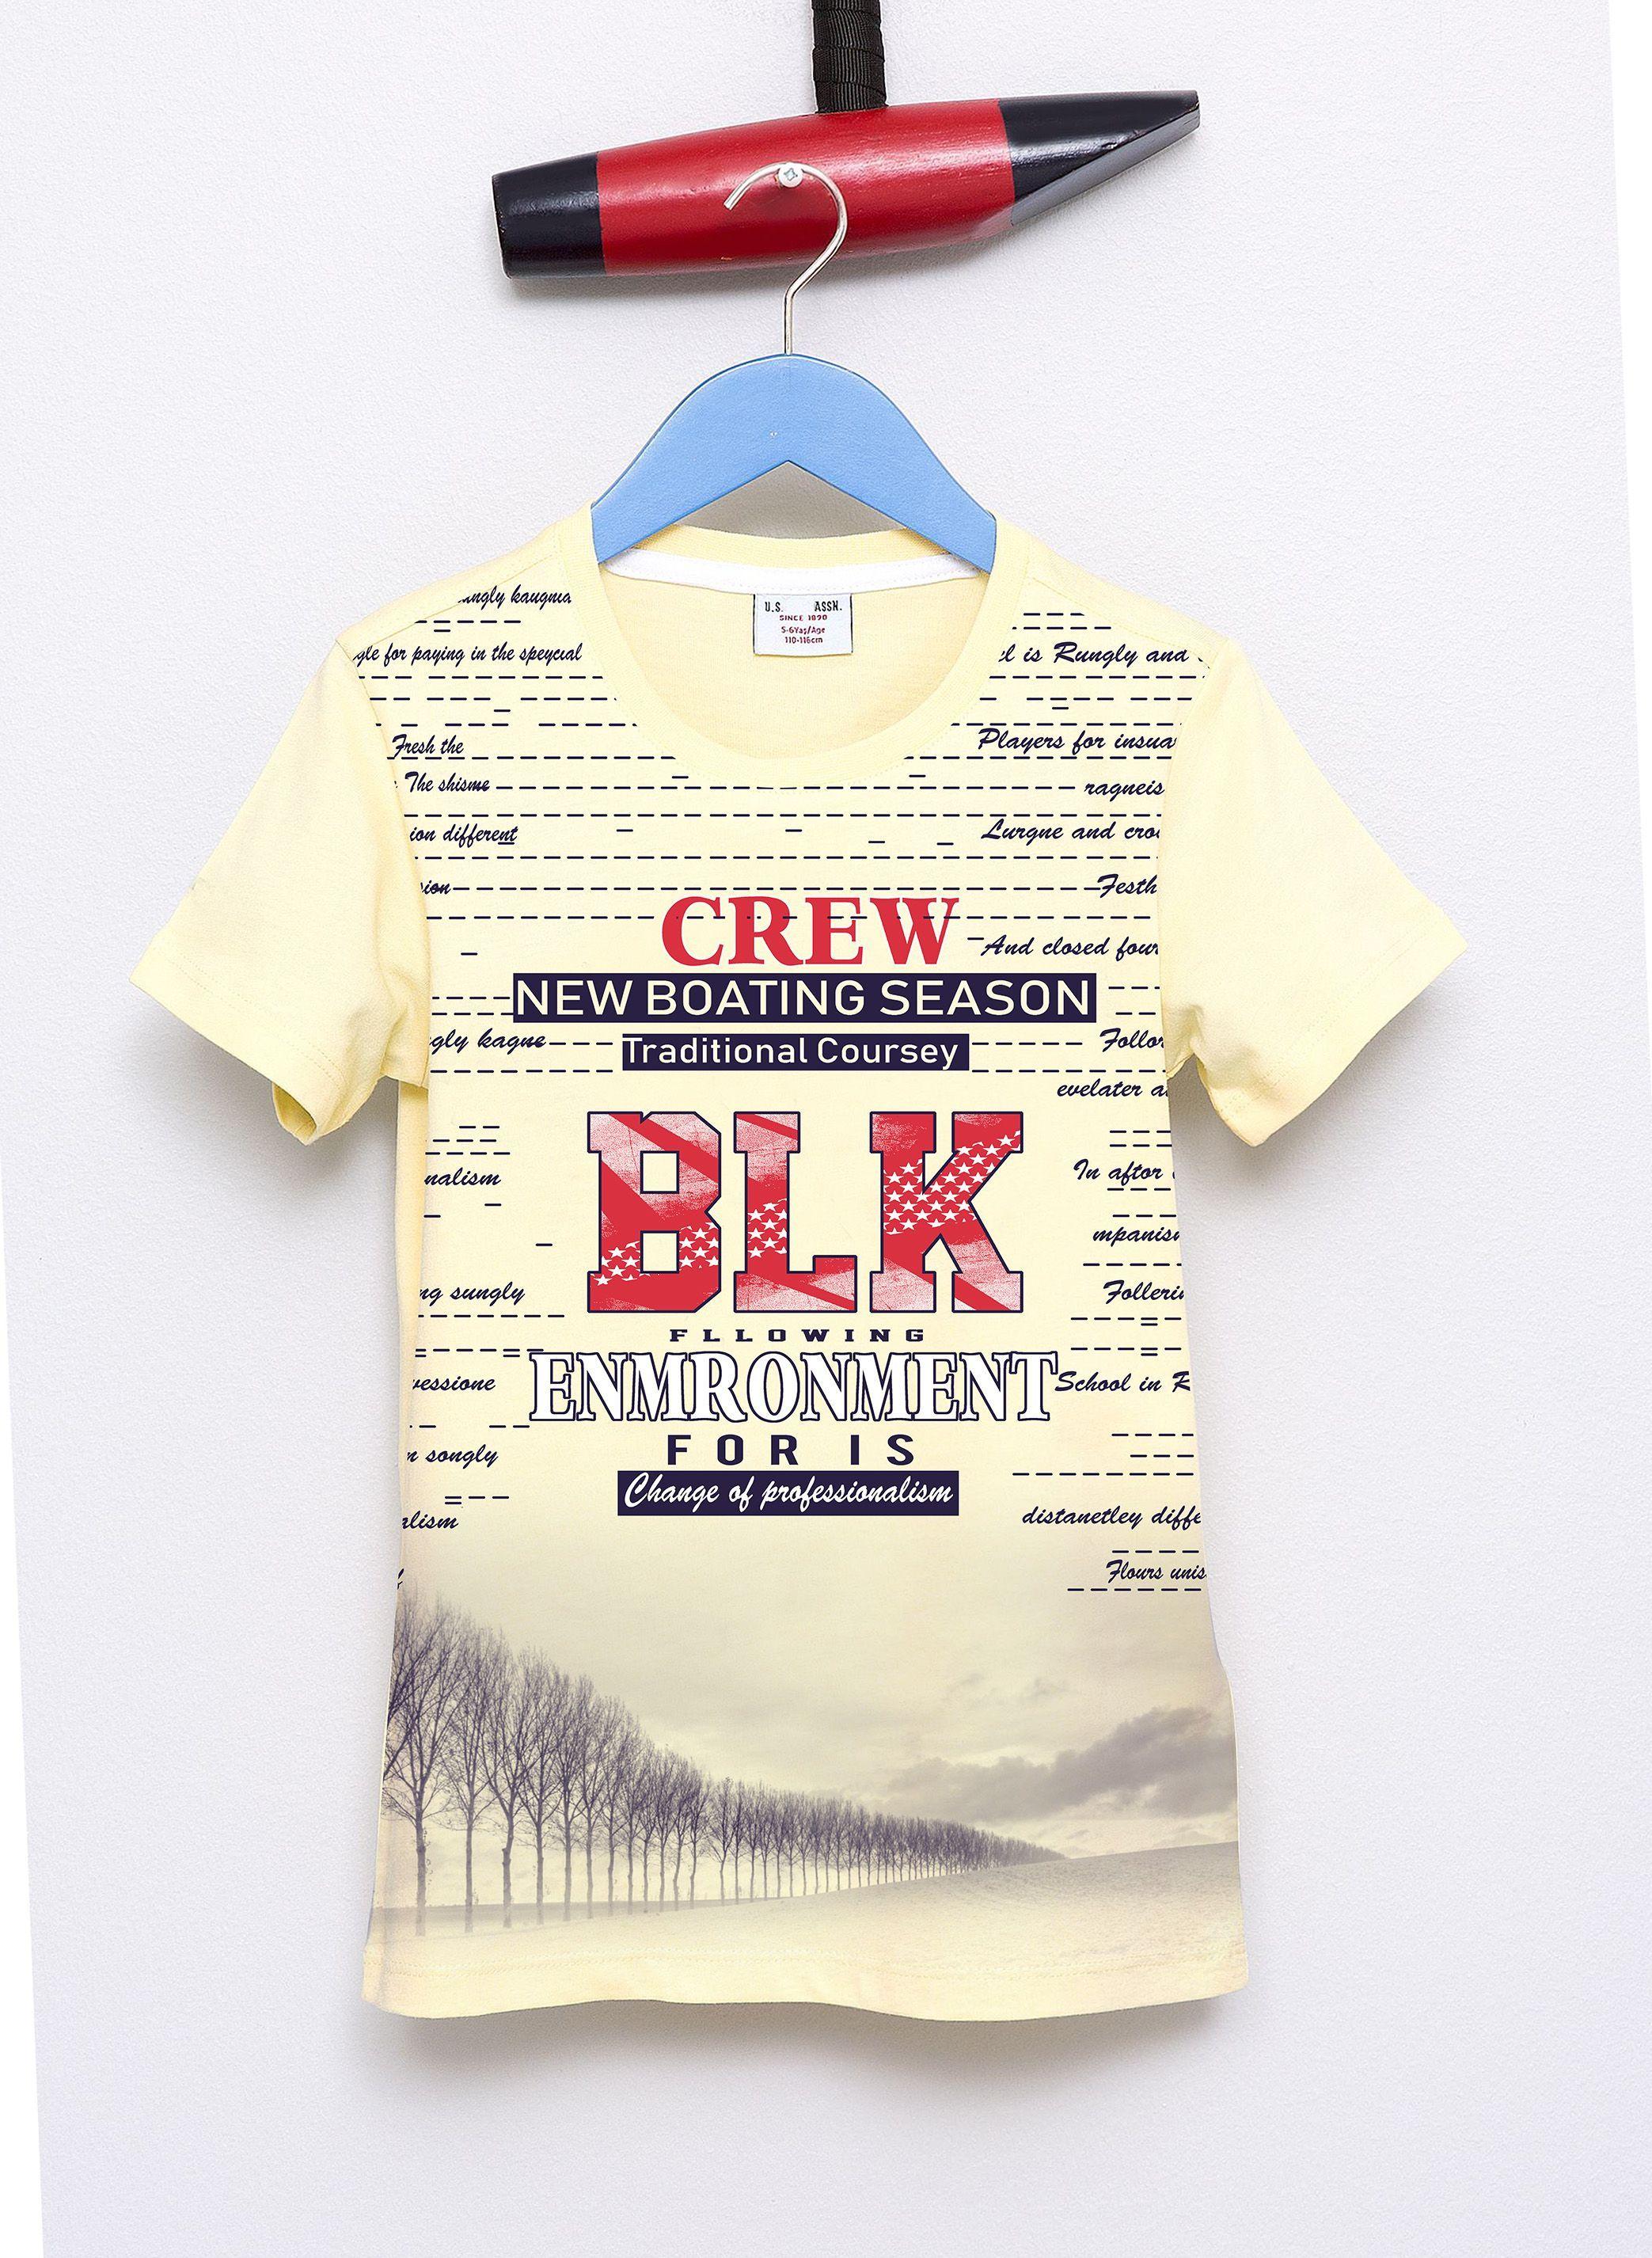 Pin by Vanessa Coninck on boys tees and shirts   Tee shirt fashion, Boys t  shirts, Shirt designs